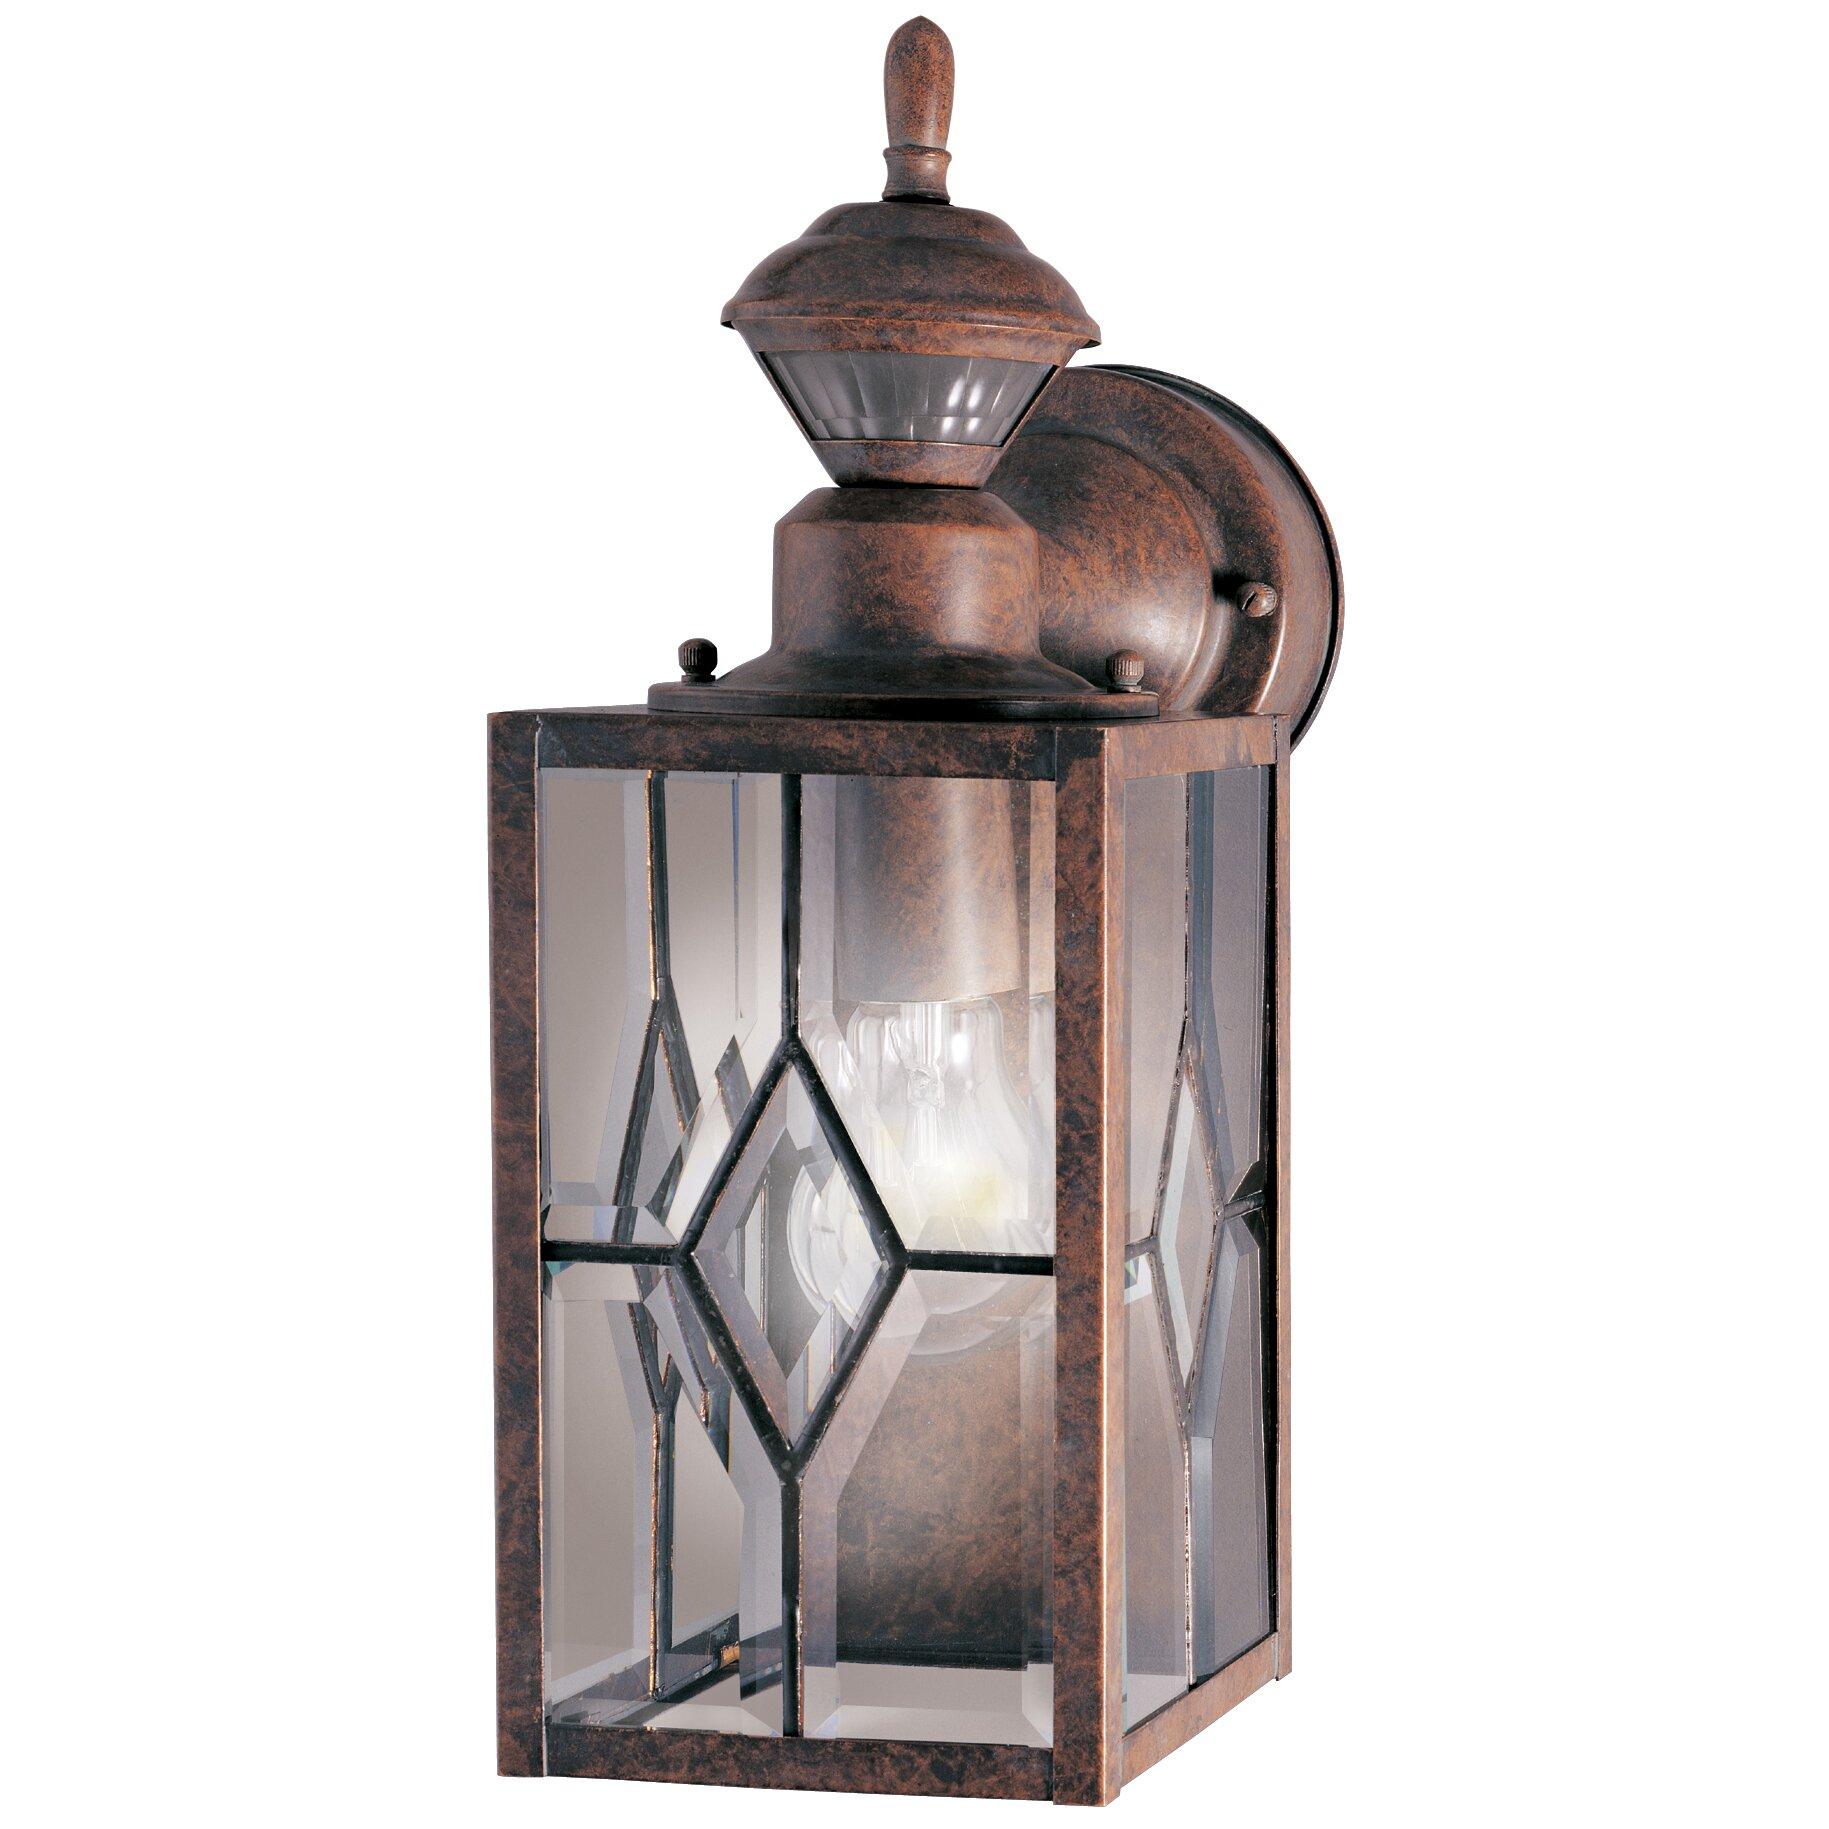 heath zenith motion activated 1 light wall lantern security light. Black Bedroom Furniture Sets. Home Design Ideas